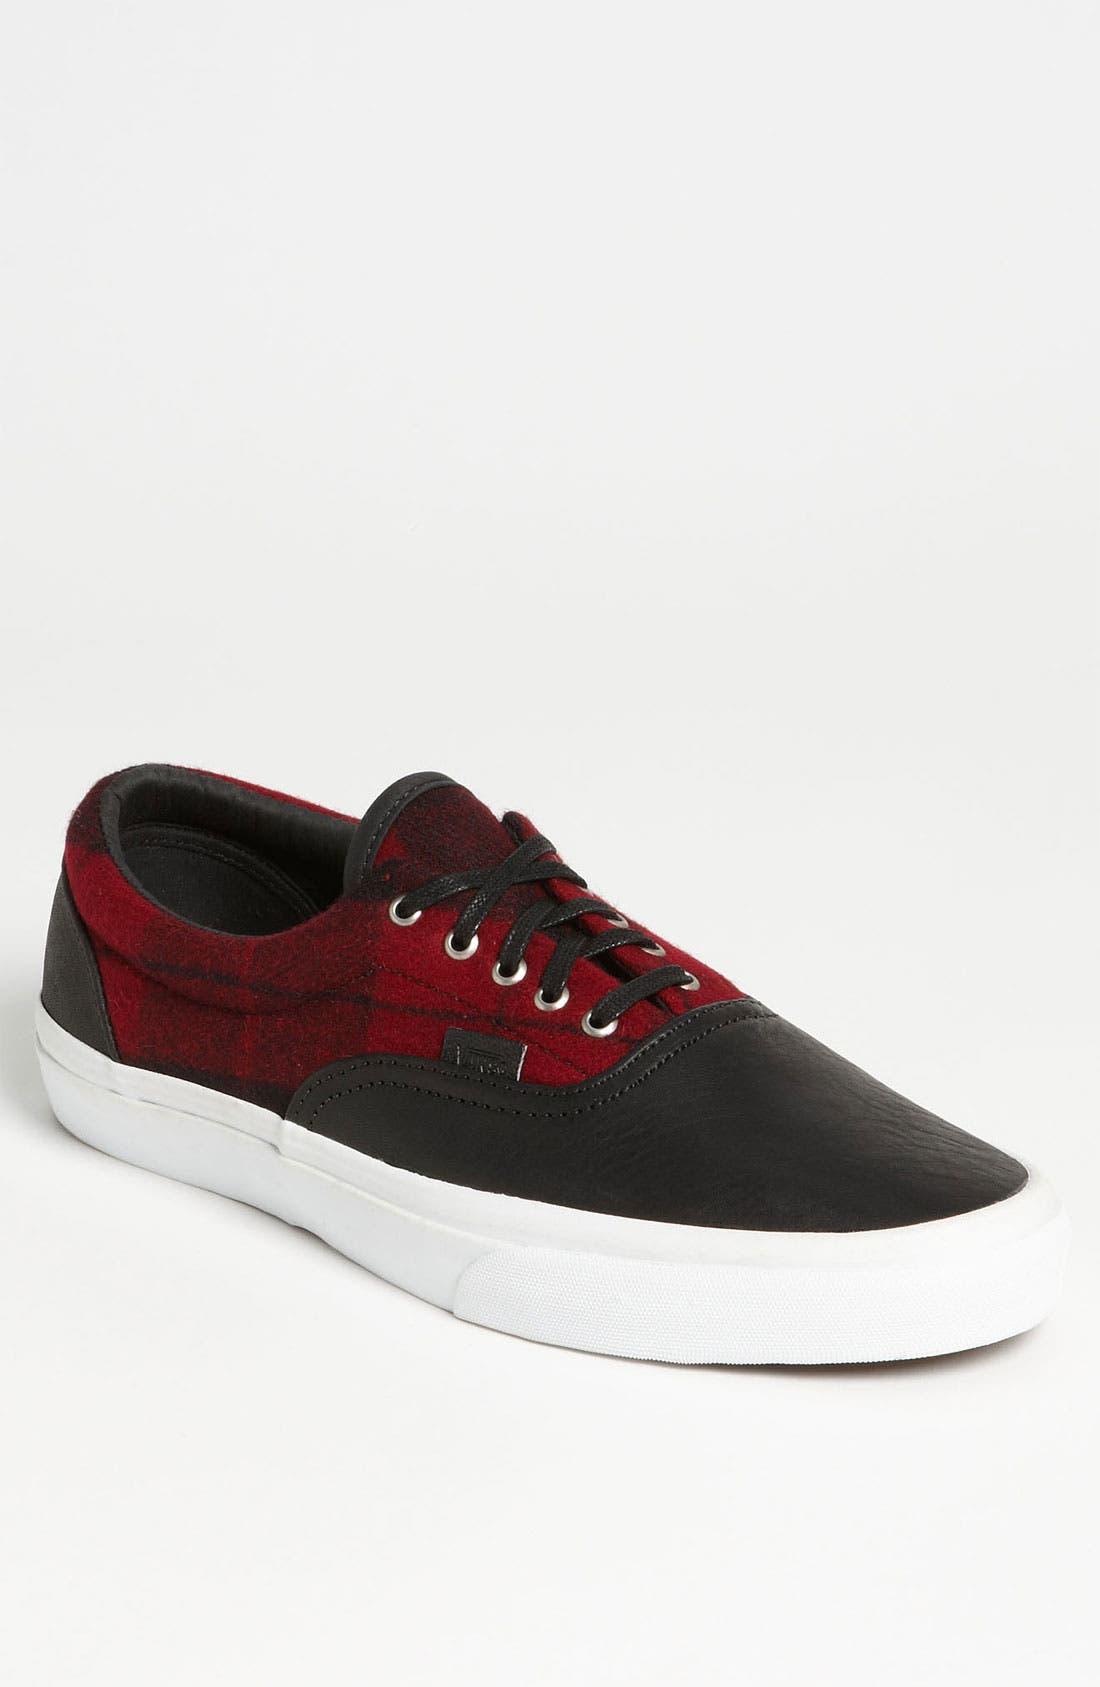 'Cali - Era' Sneaker,                             Main thumbnail 1, color,                             001